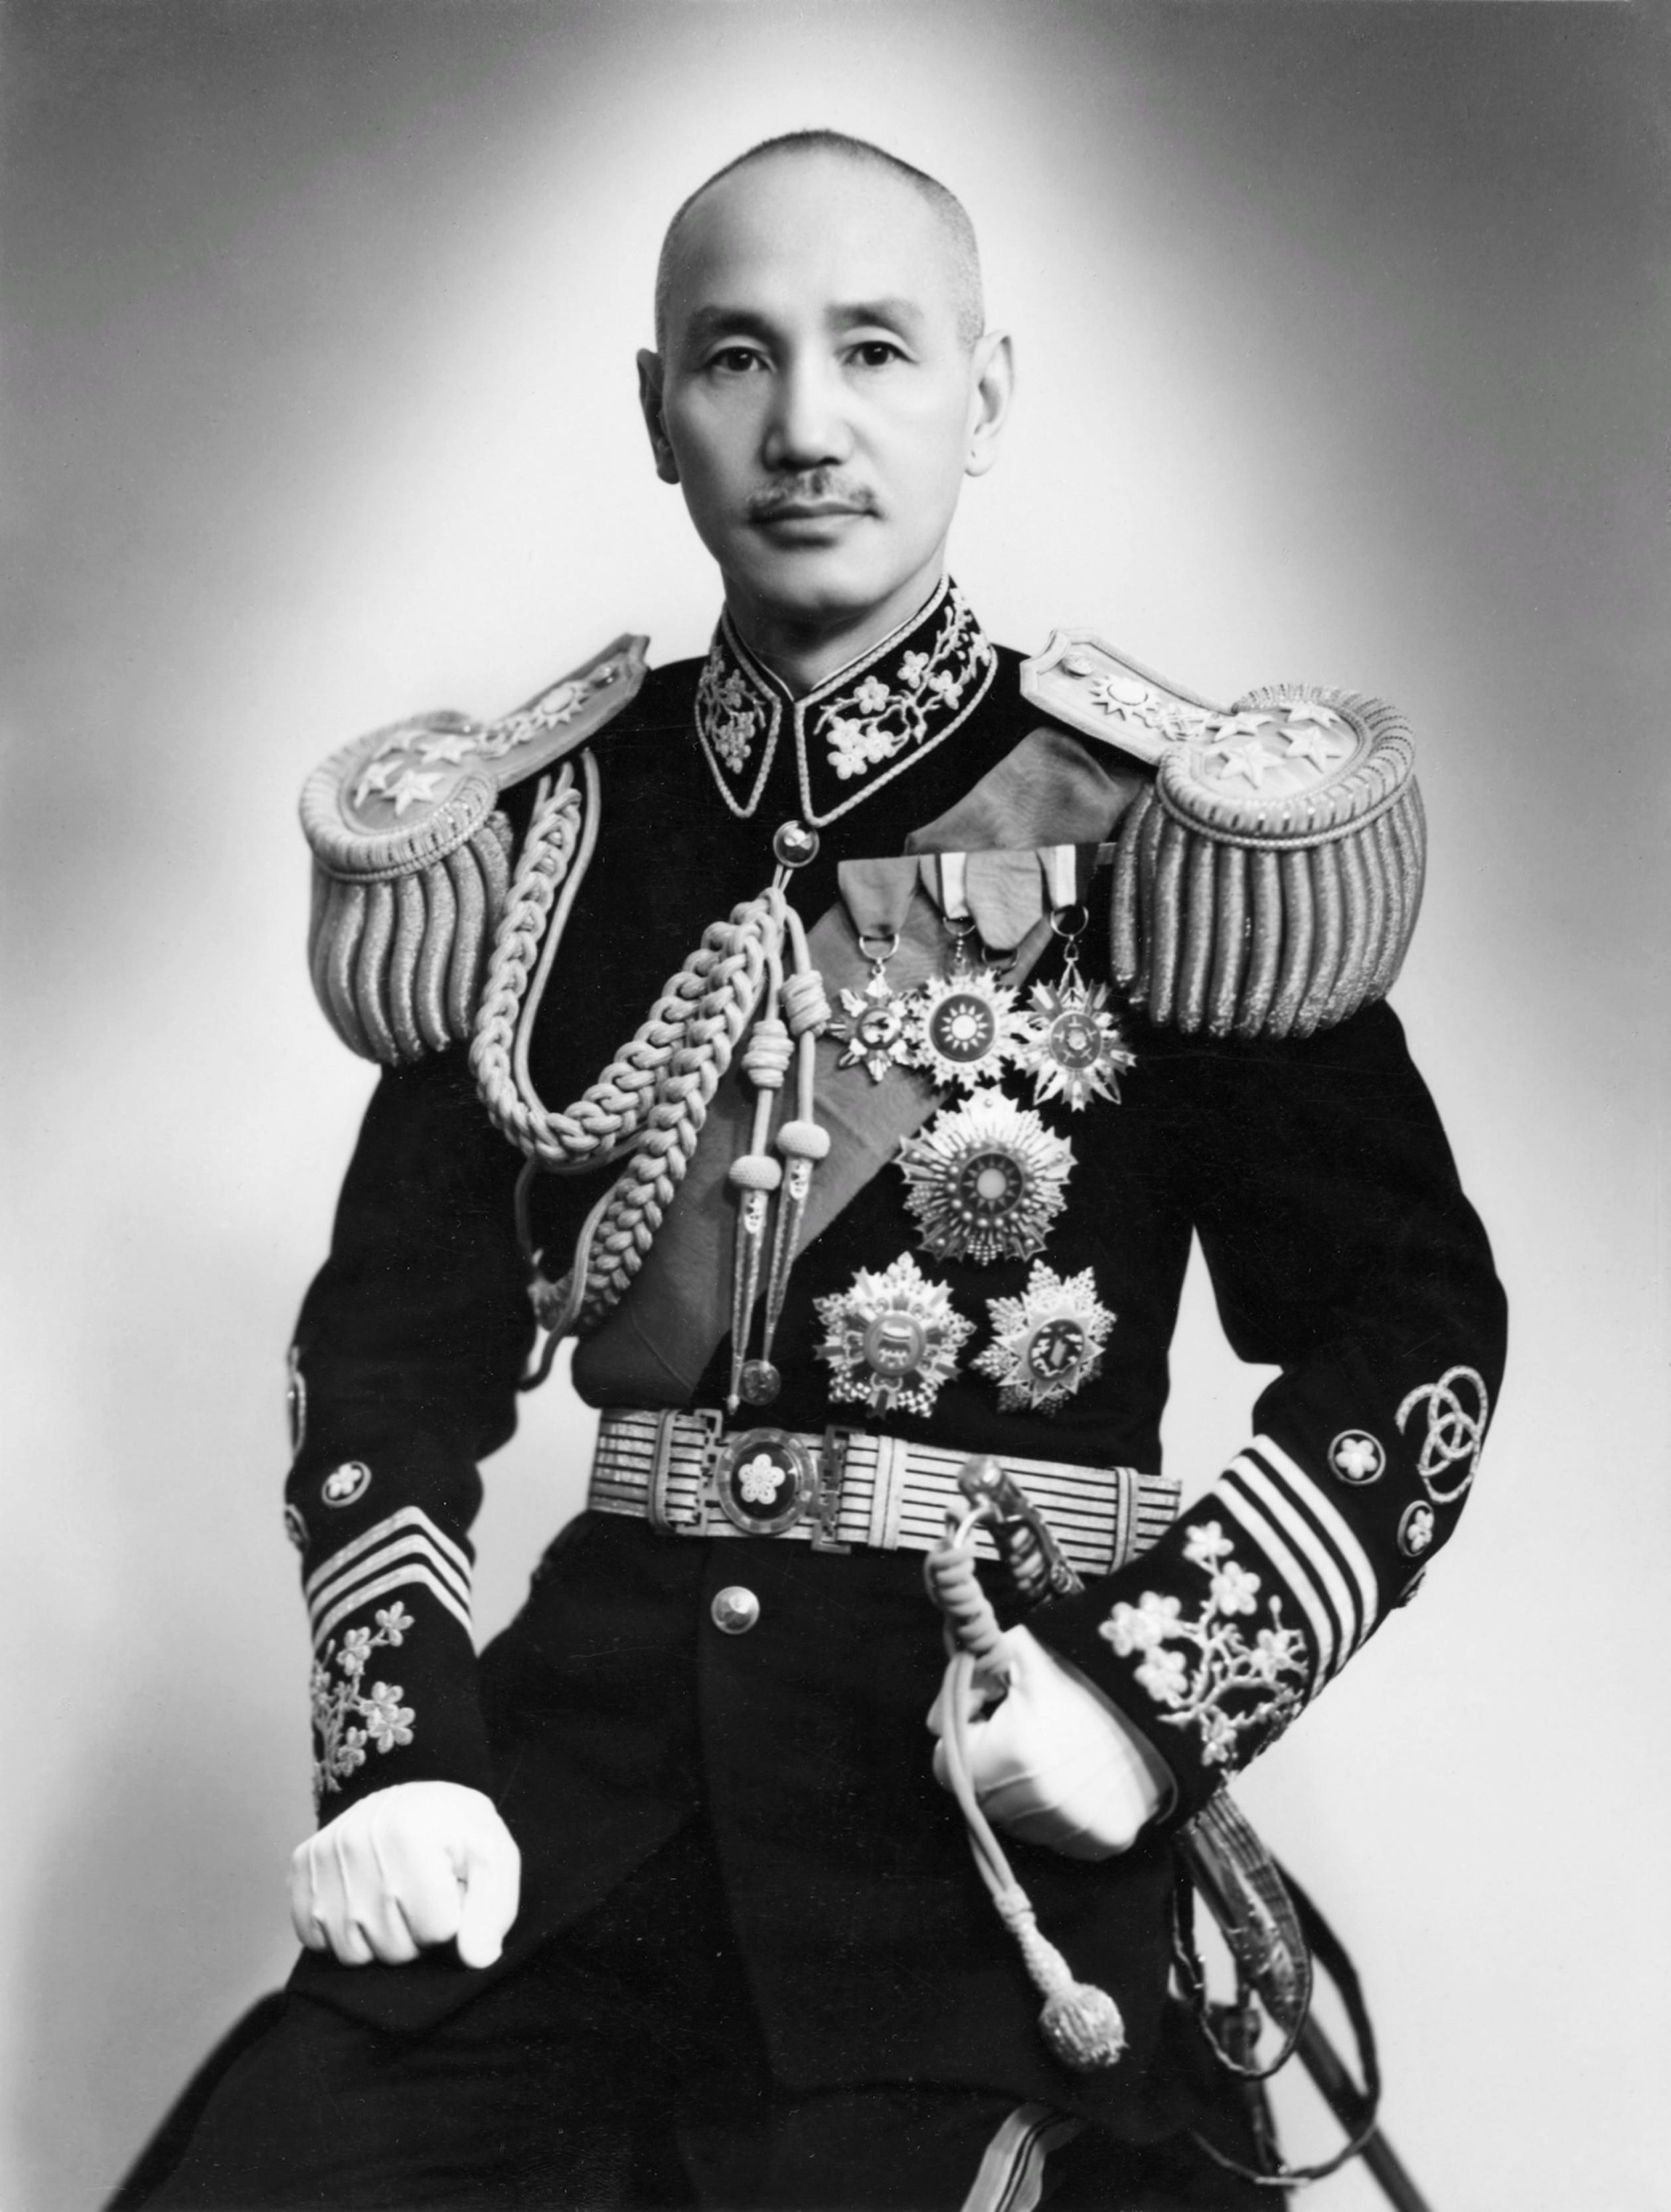 Chiang_Kai-shek%EF%BC%88%E8%94%A3%E4%B8%AD%E6%AD%A3%EF%BC%89.jpg